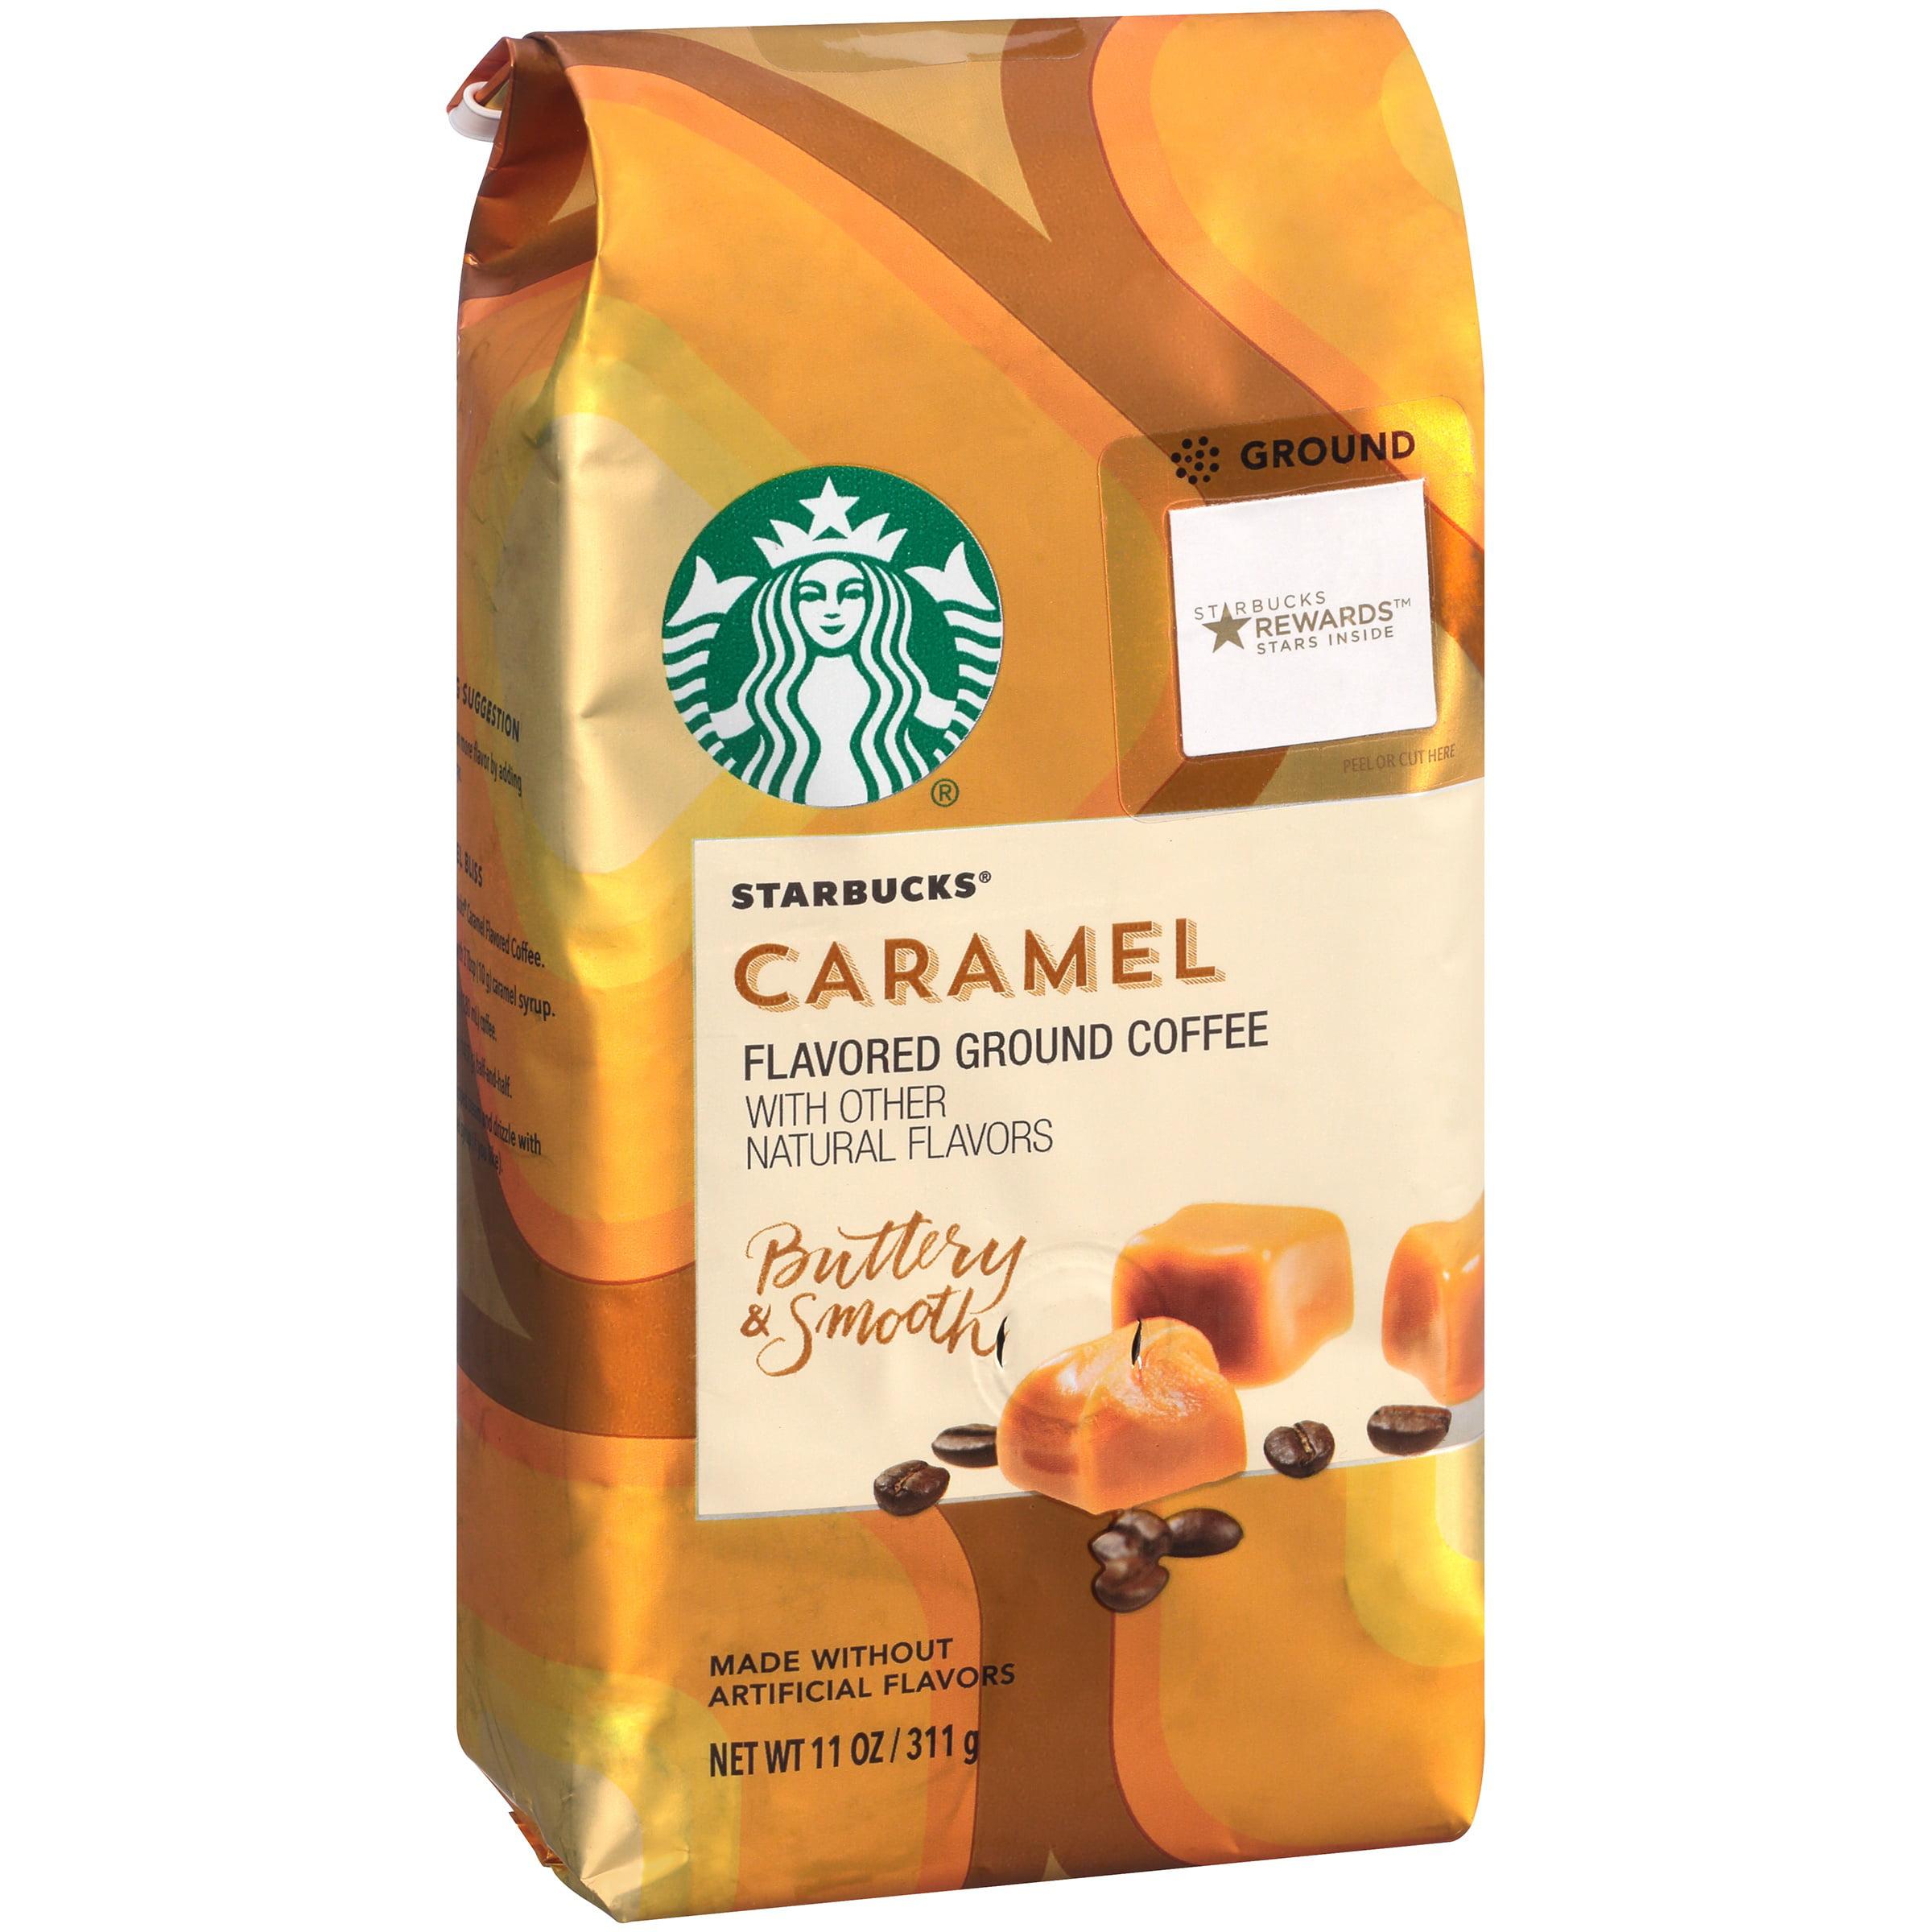 Iced Caramel Macchiato Nutrition Facts Starbucks